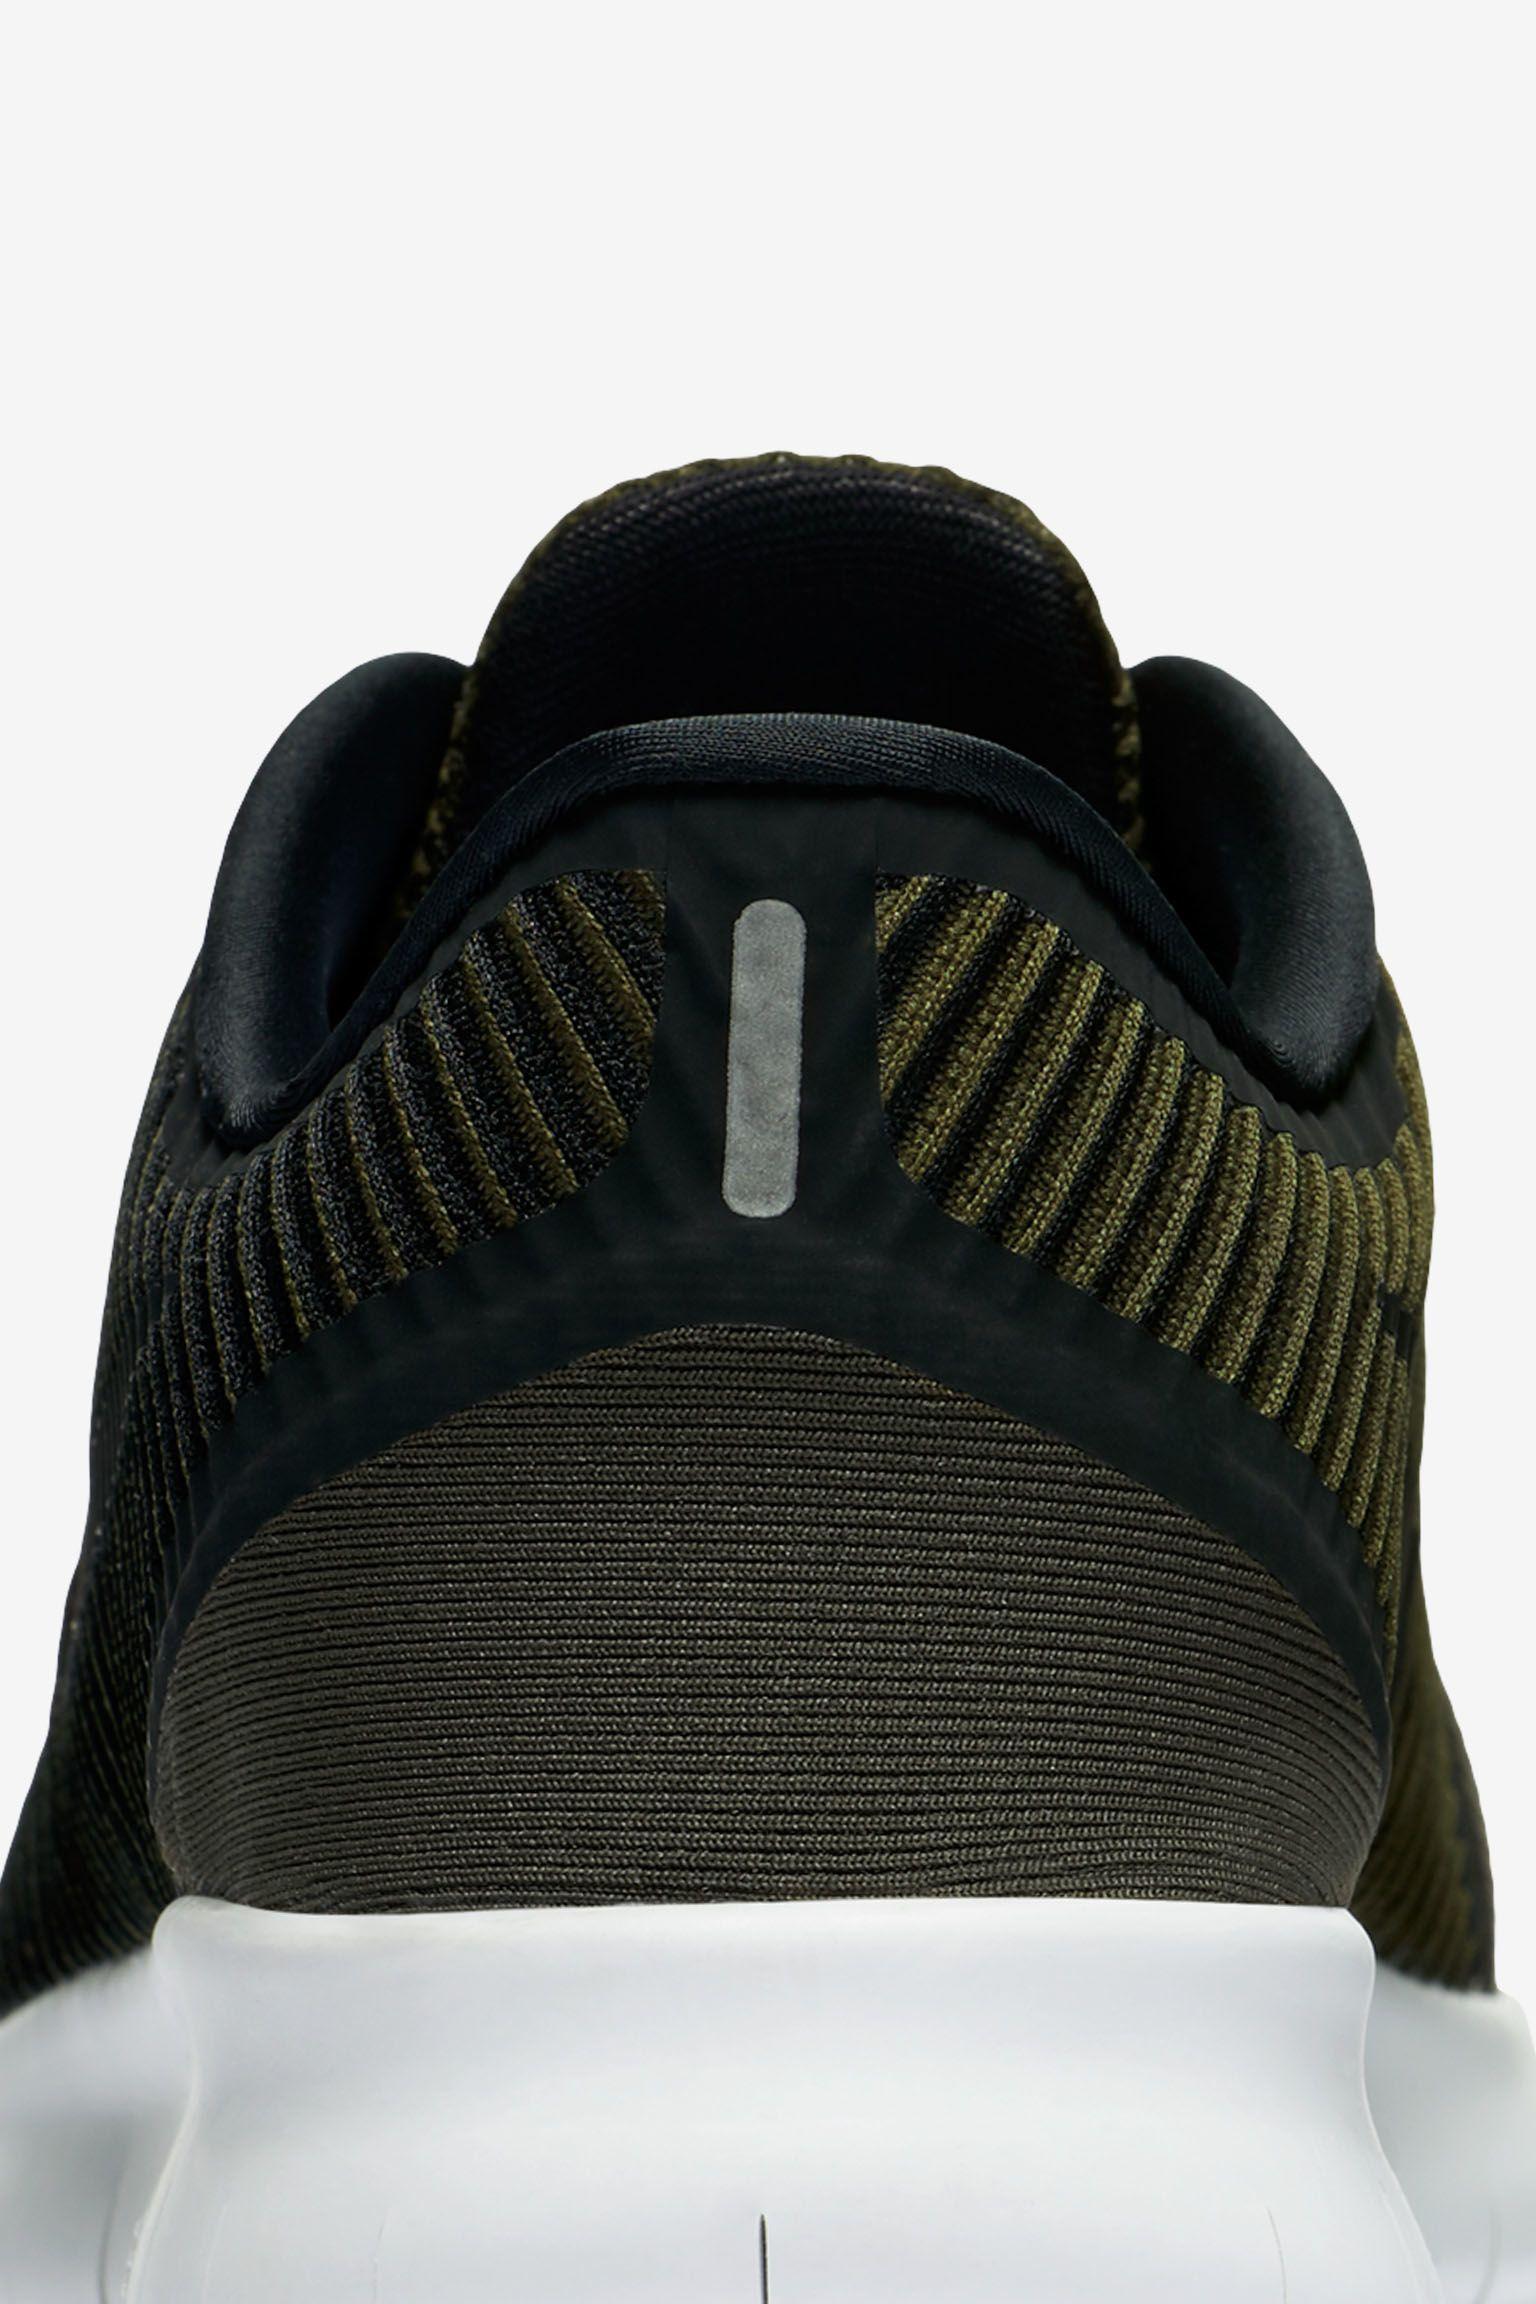 Nike Free Run Commuter 'Cargo Khaki'